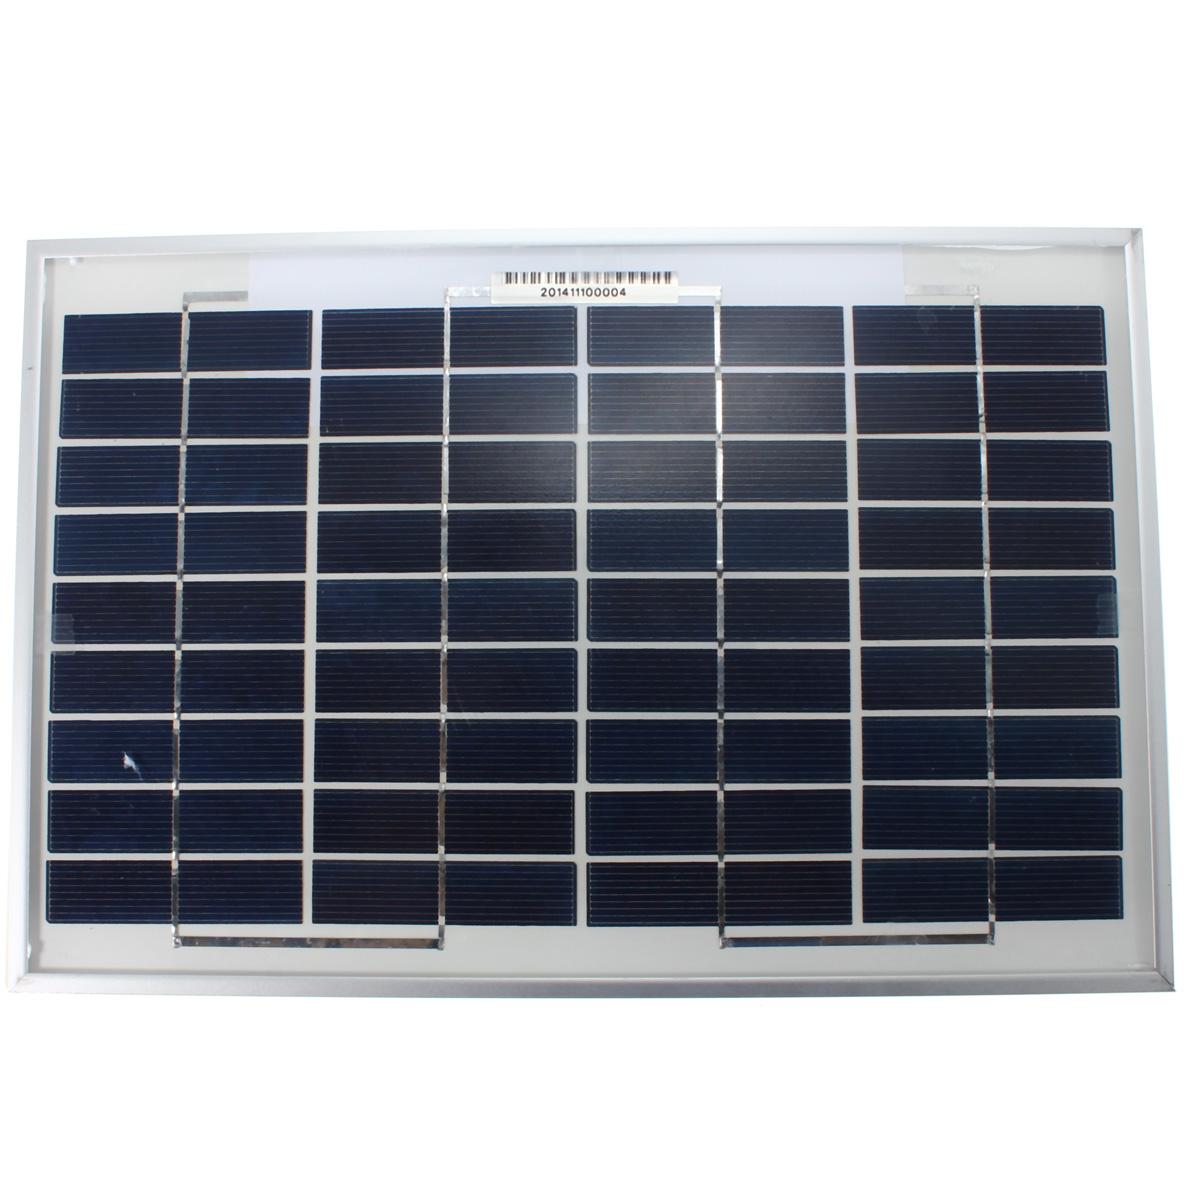 10w watt solar panel 12v poly modul end 7 21 2018 11 15 pm. Black Bedroom Furniture Sets. Home Design Ideas